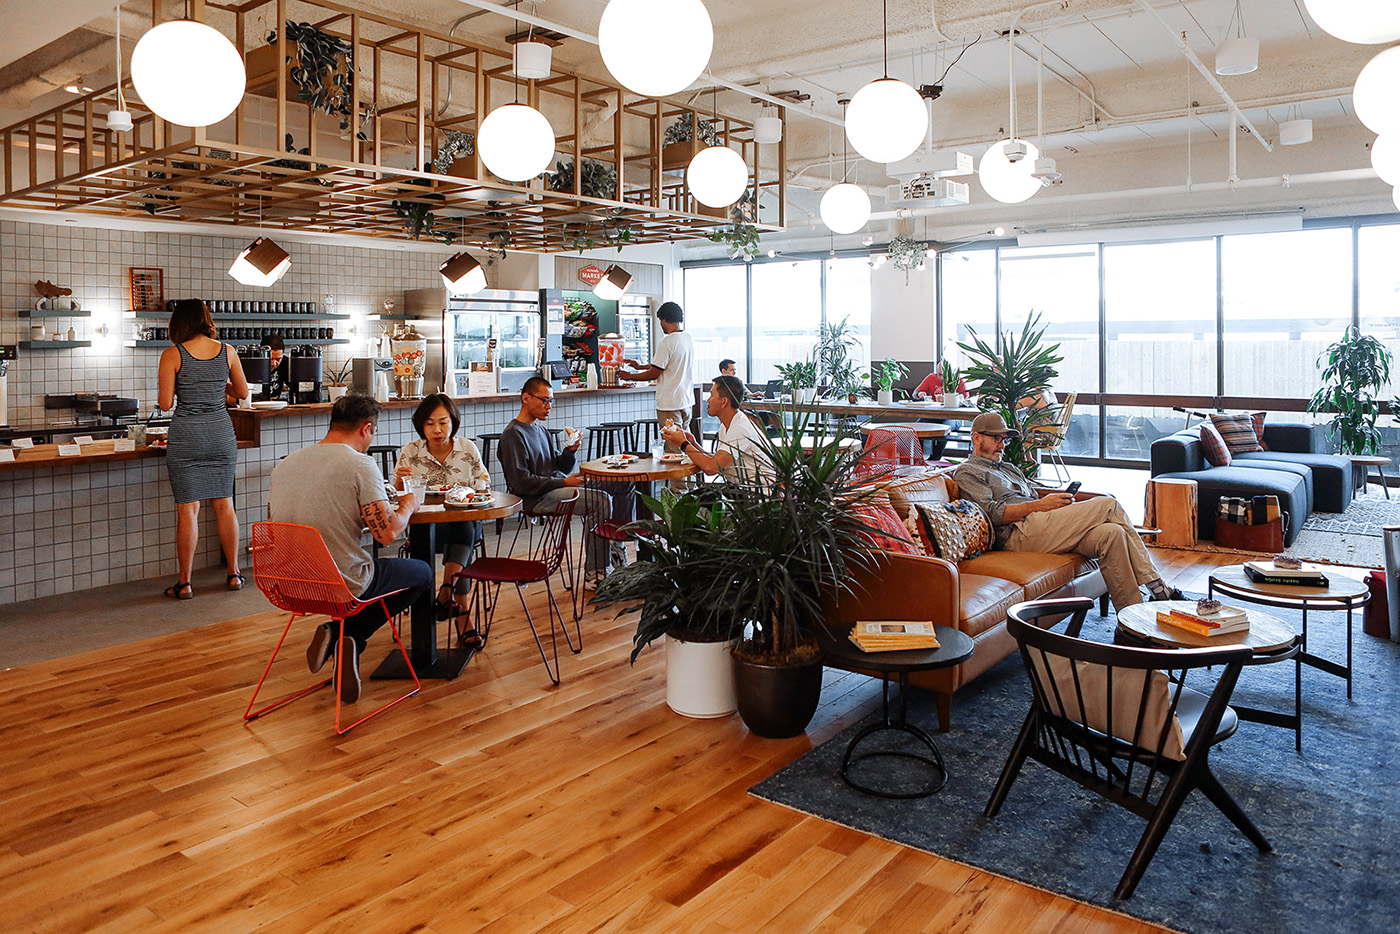 An Inside Look At Wework S Pasadena Coworking Space